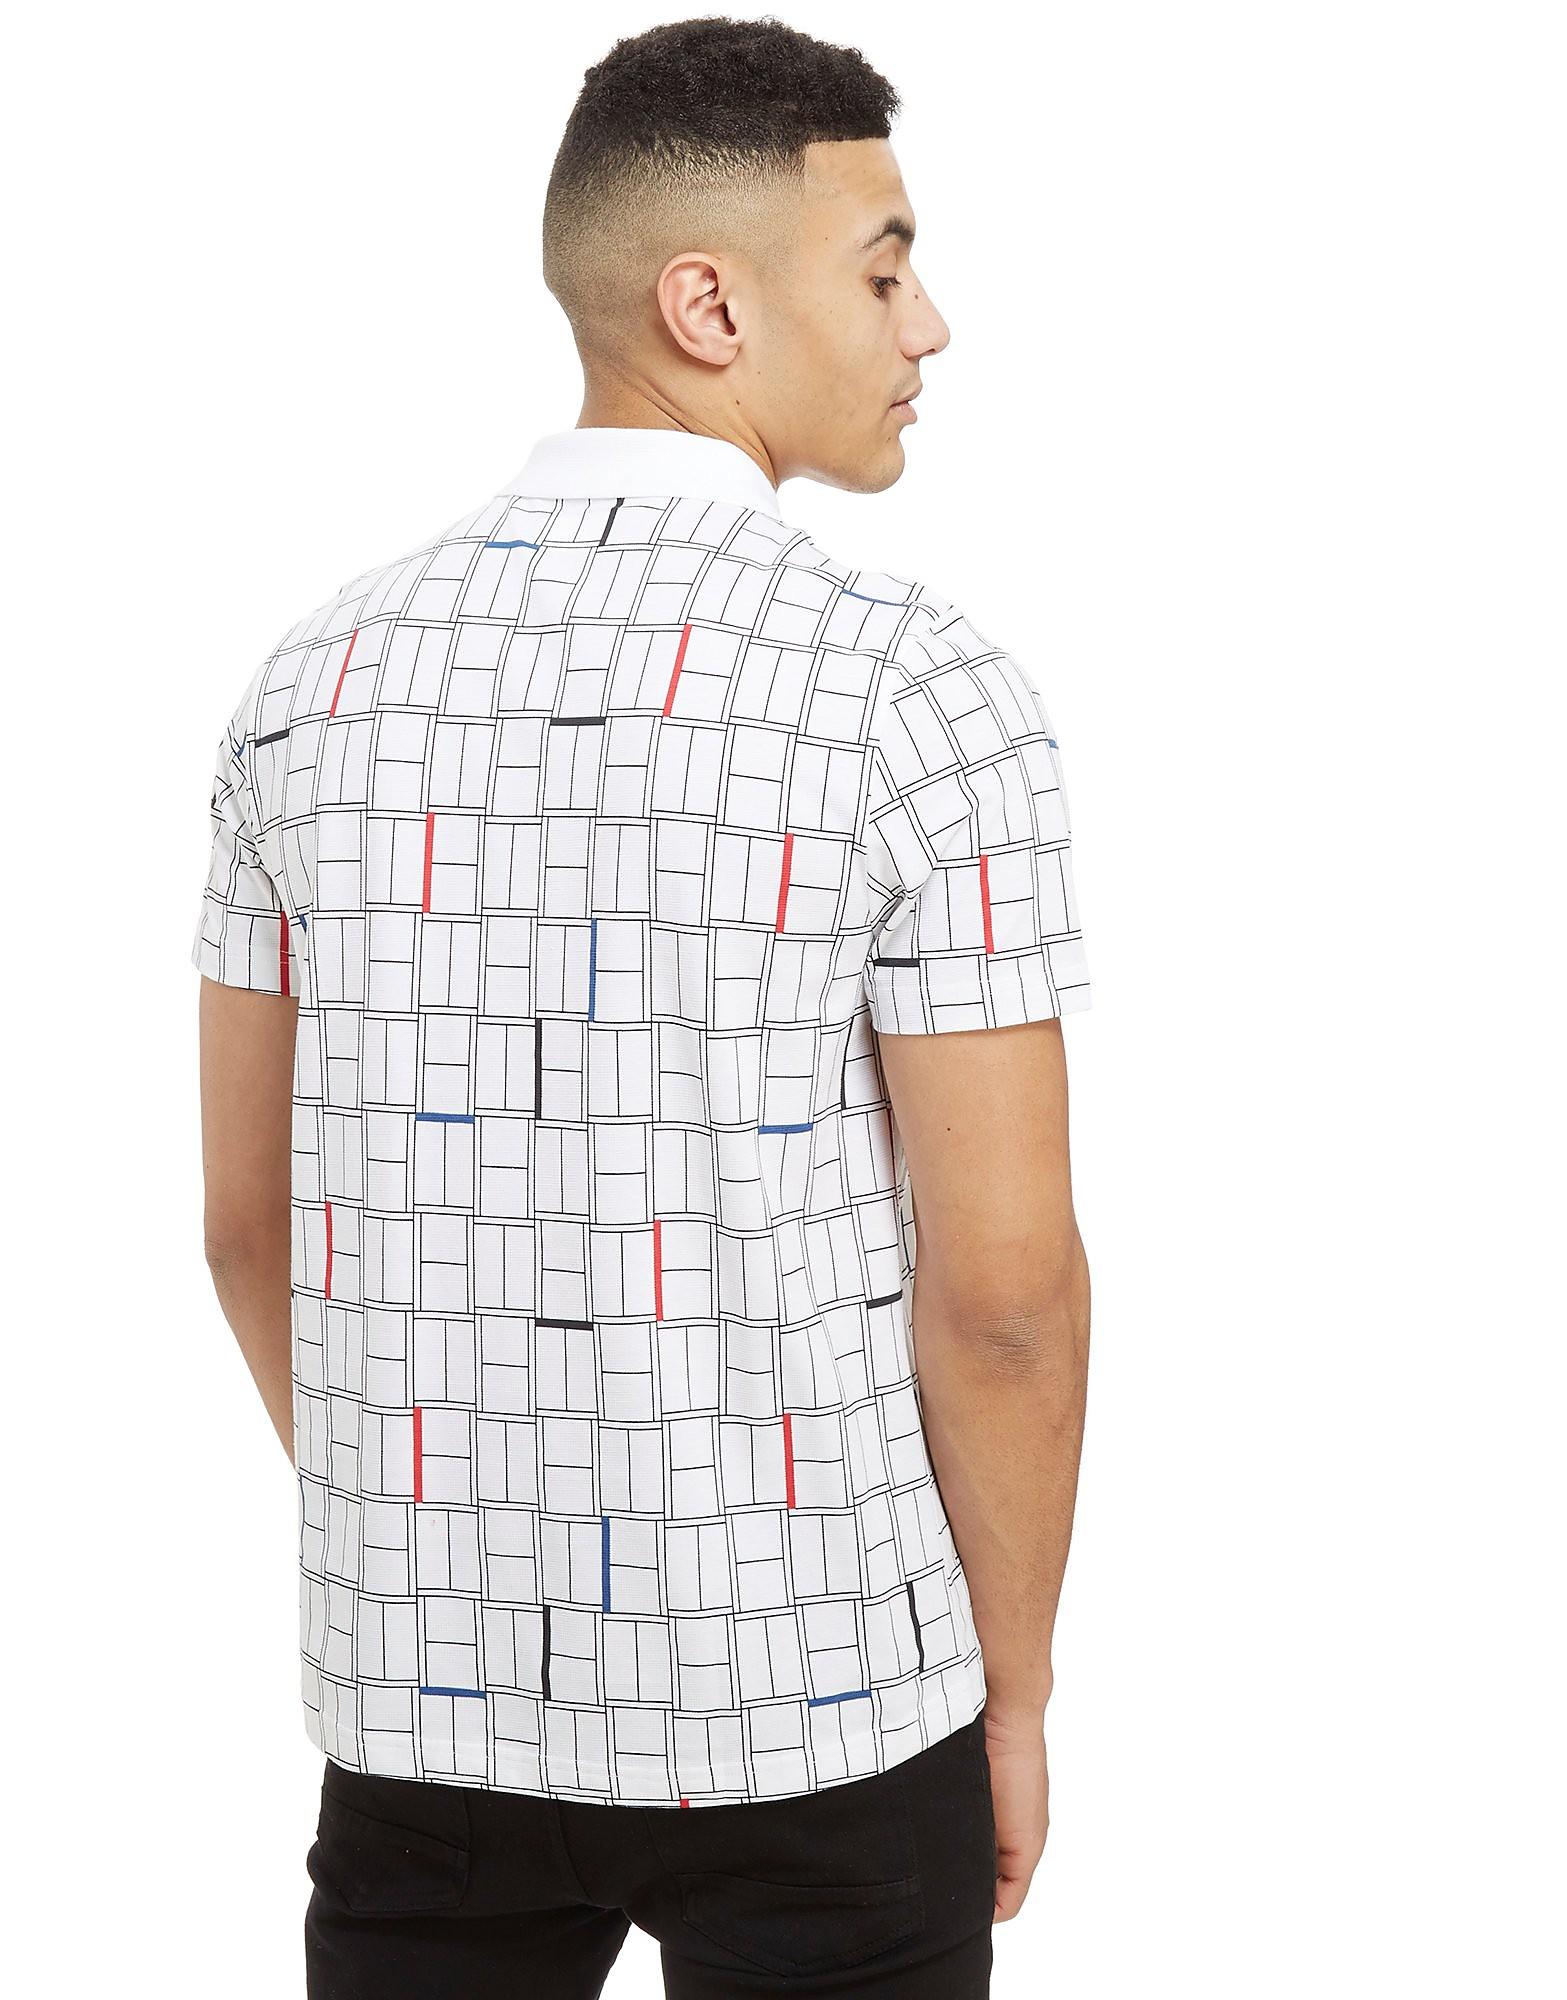 Lacoste Djokovic Grid Check Polo Shirt